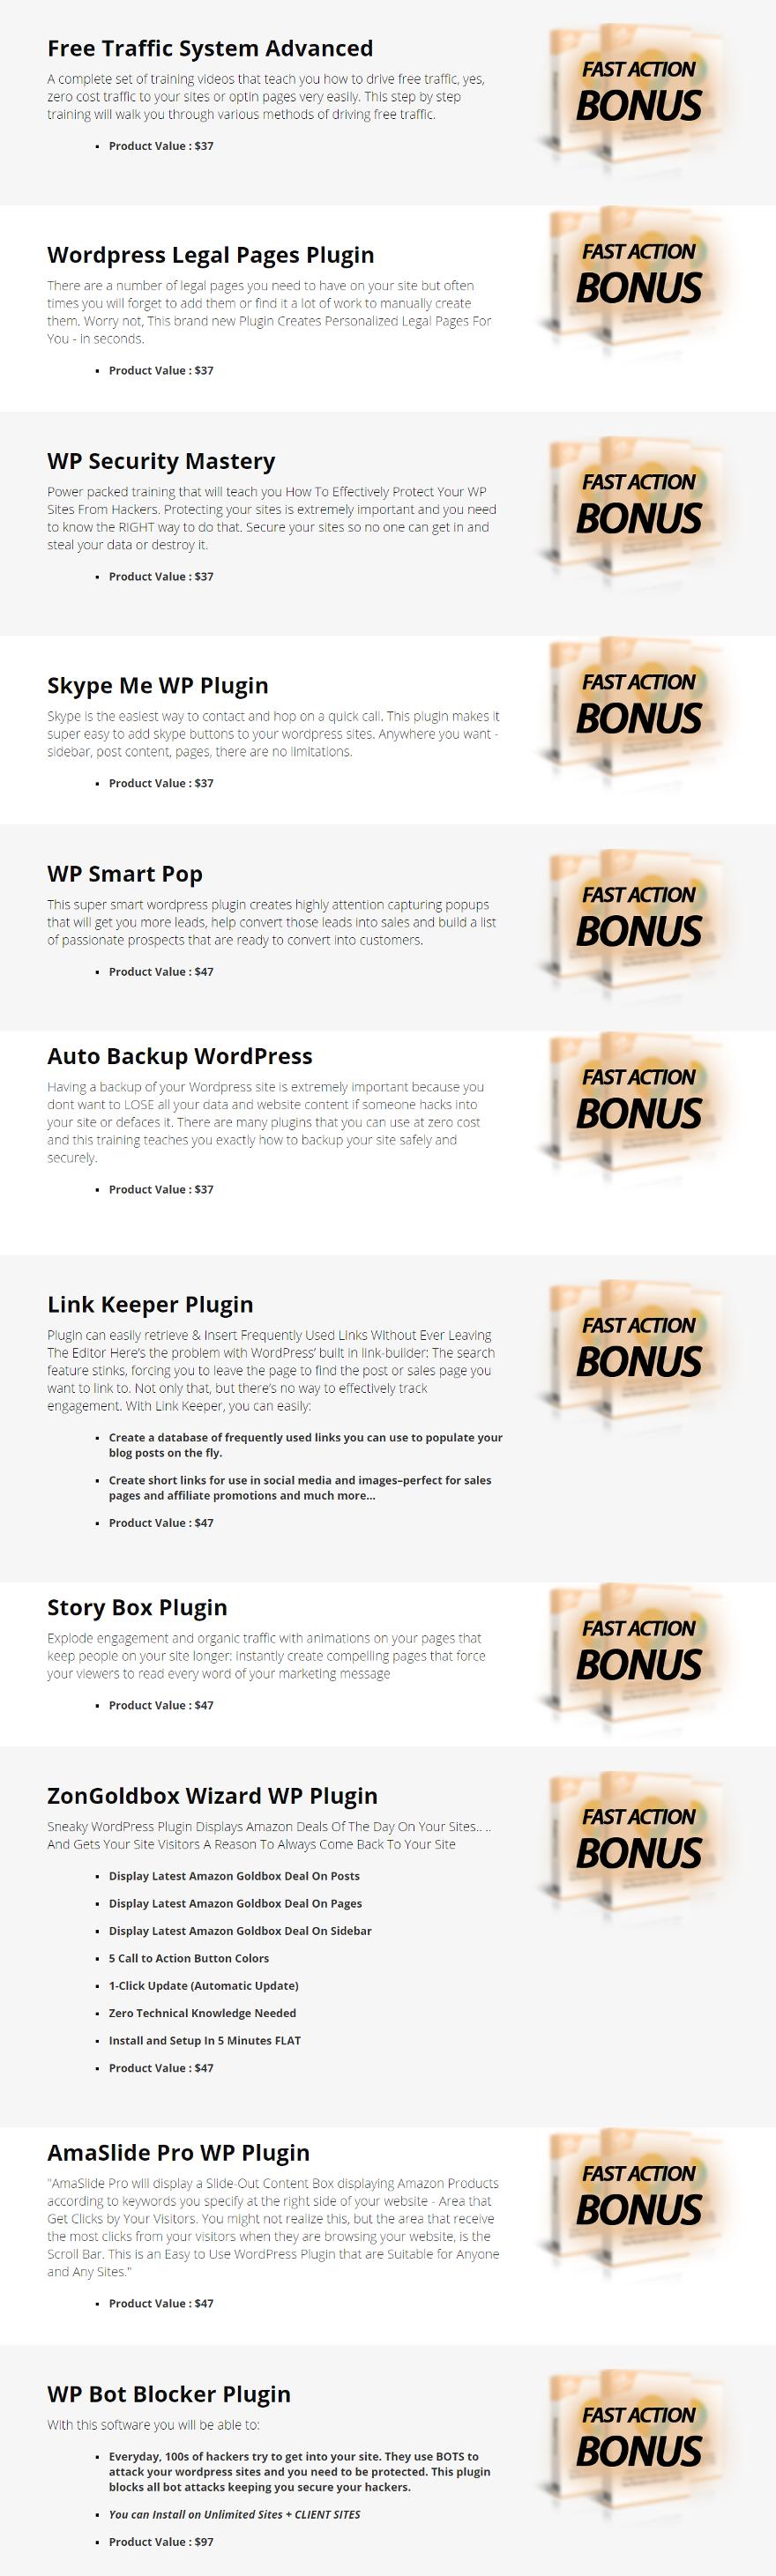 FotoPress Bonuses